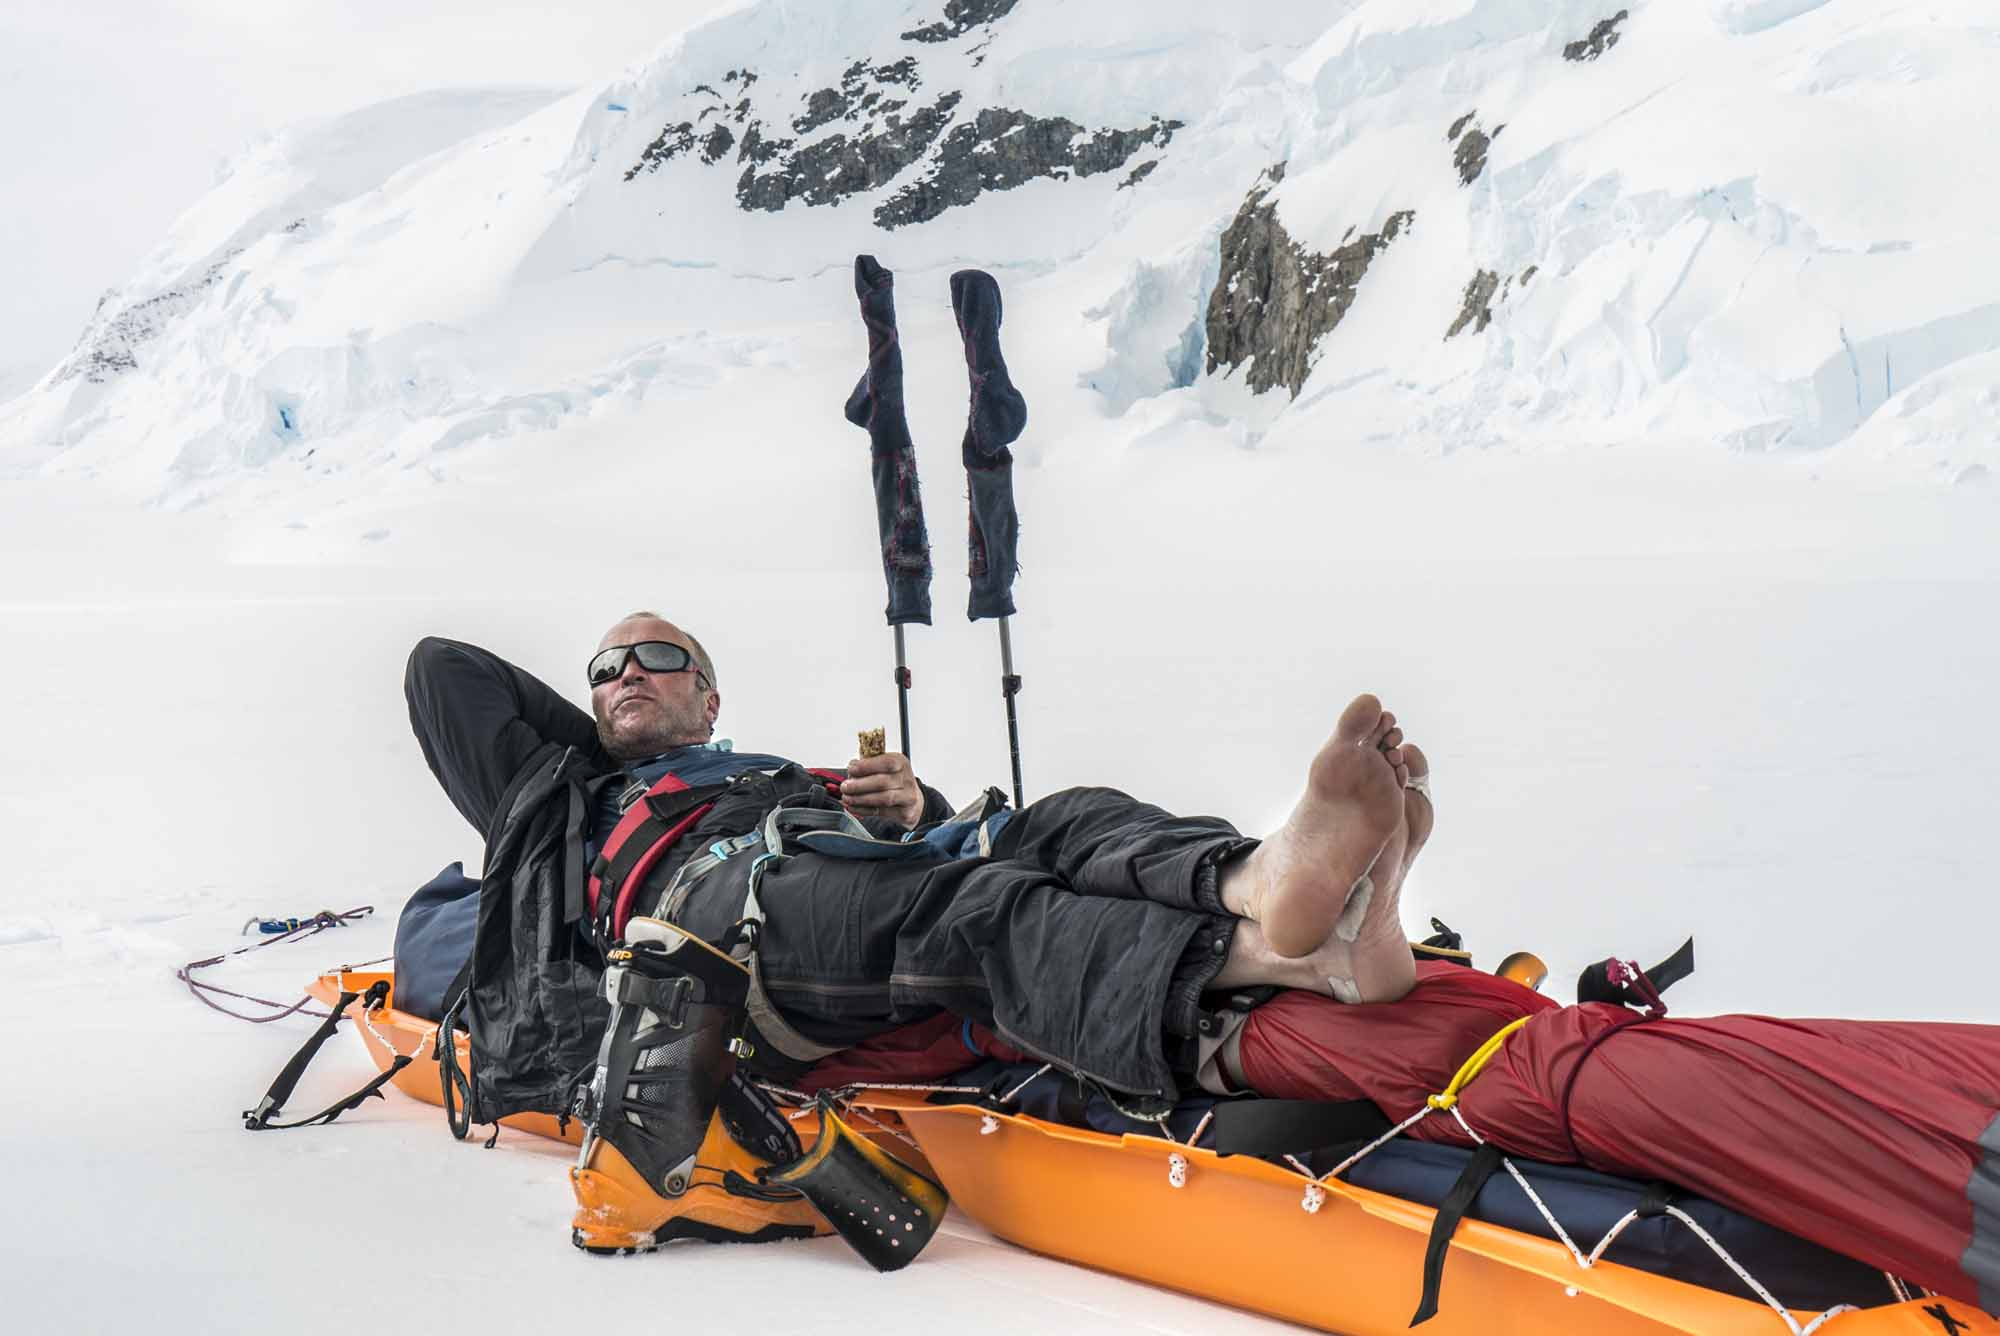 Polar-Quest-Exploration-Polaire-Exploring-Boundaries-in-Antarctica-Caroline-Cote-photo-Phil-Wickens-enjoys-the-view